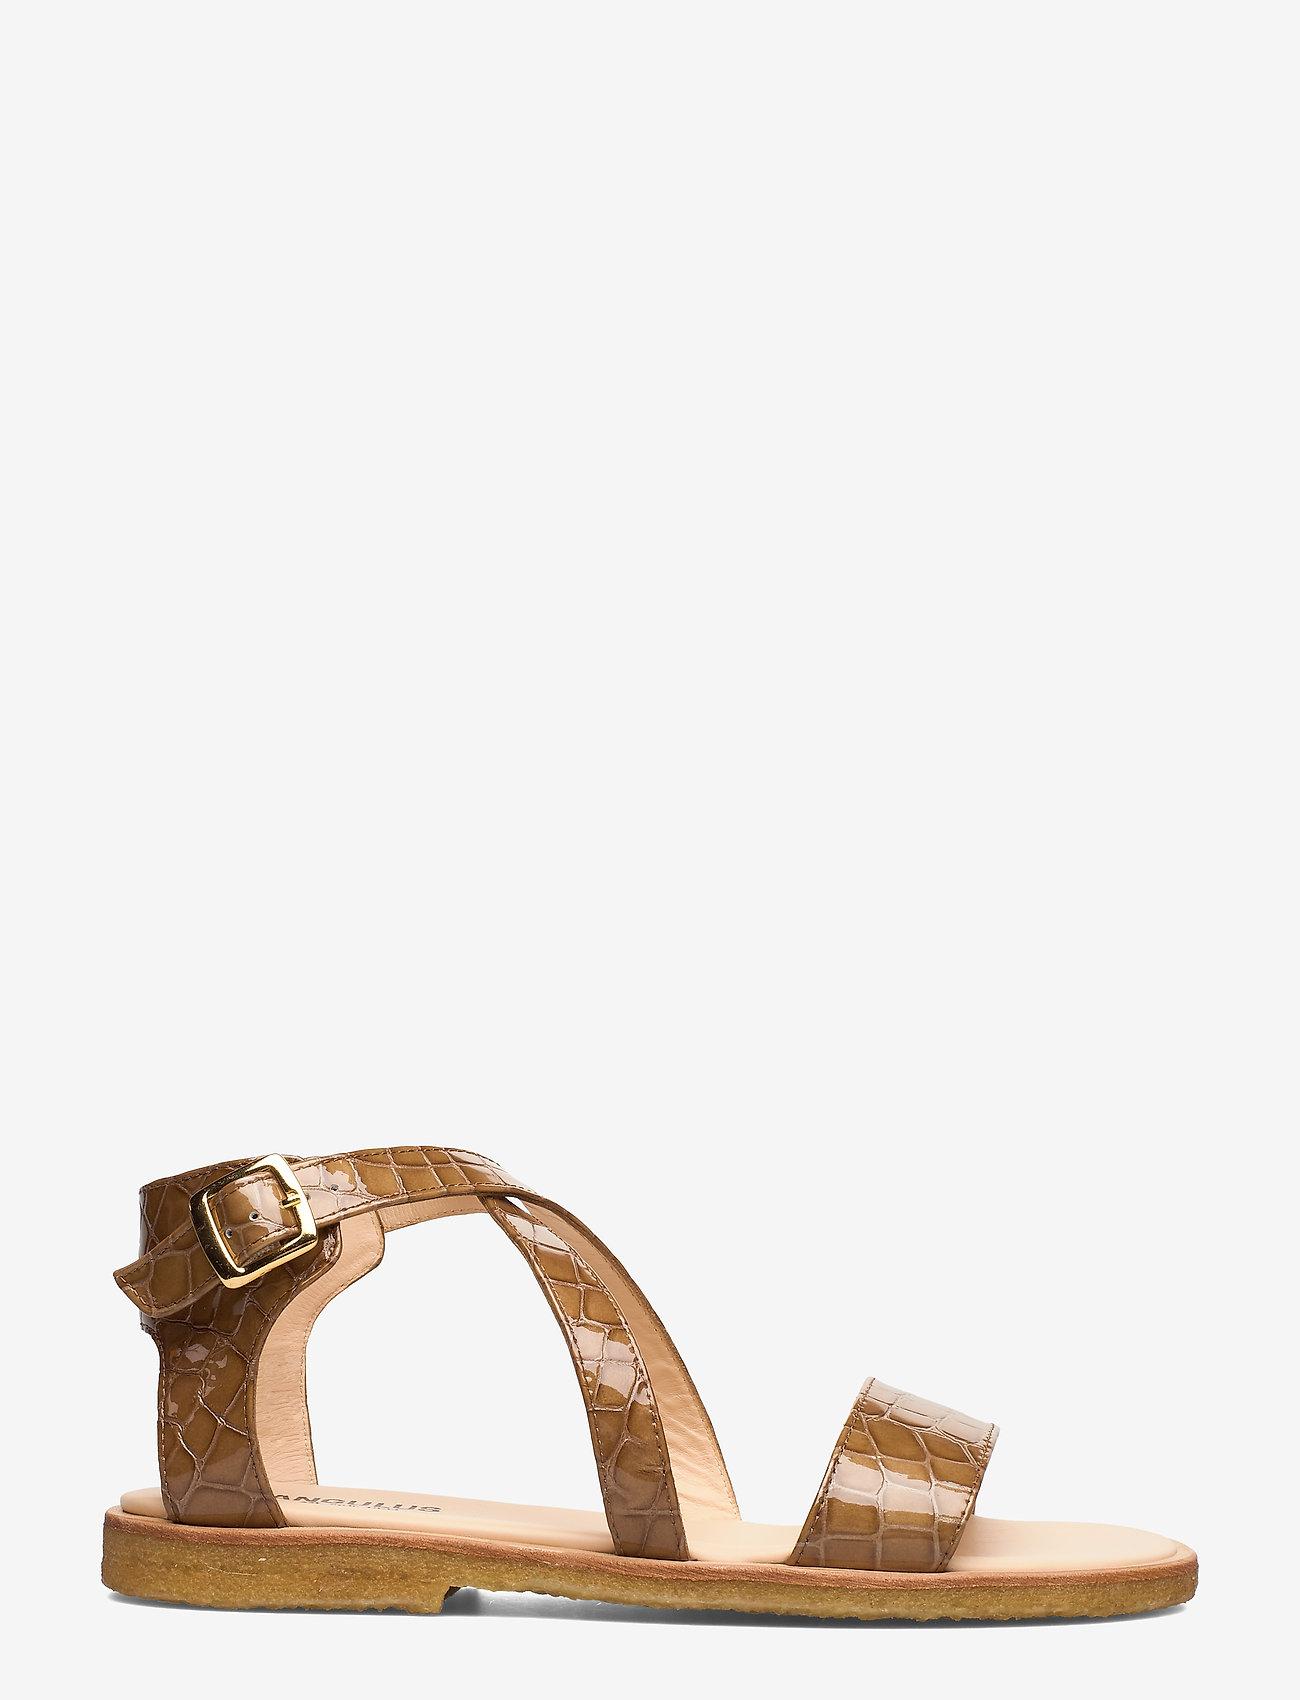 ANGULUS - 5442 - platta sandaler - 1671 tan krokodille - 1